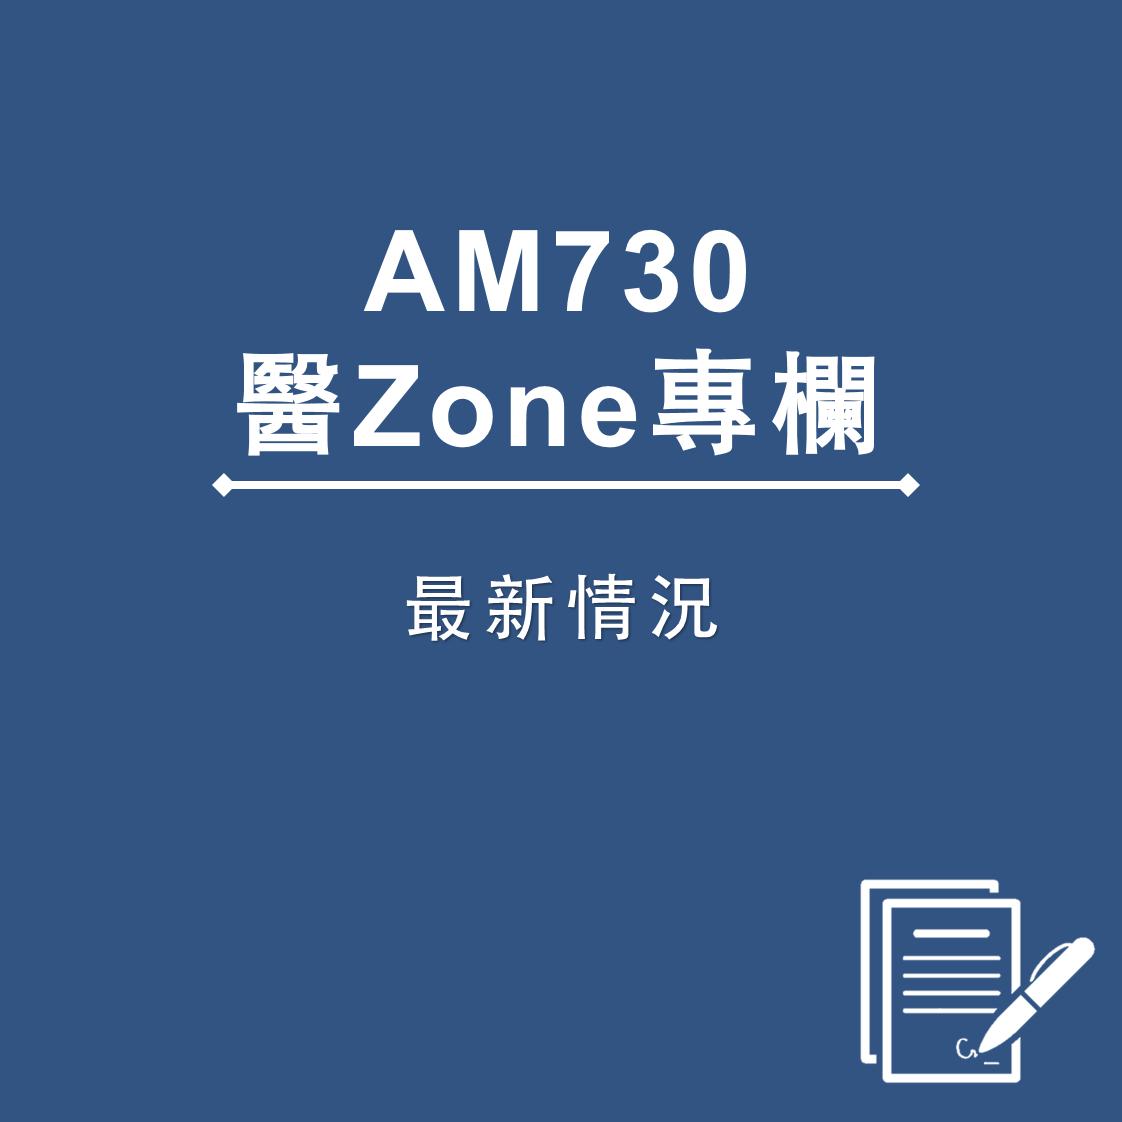 AM730 醫Zone 專欄 - 最新情況